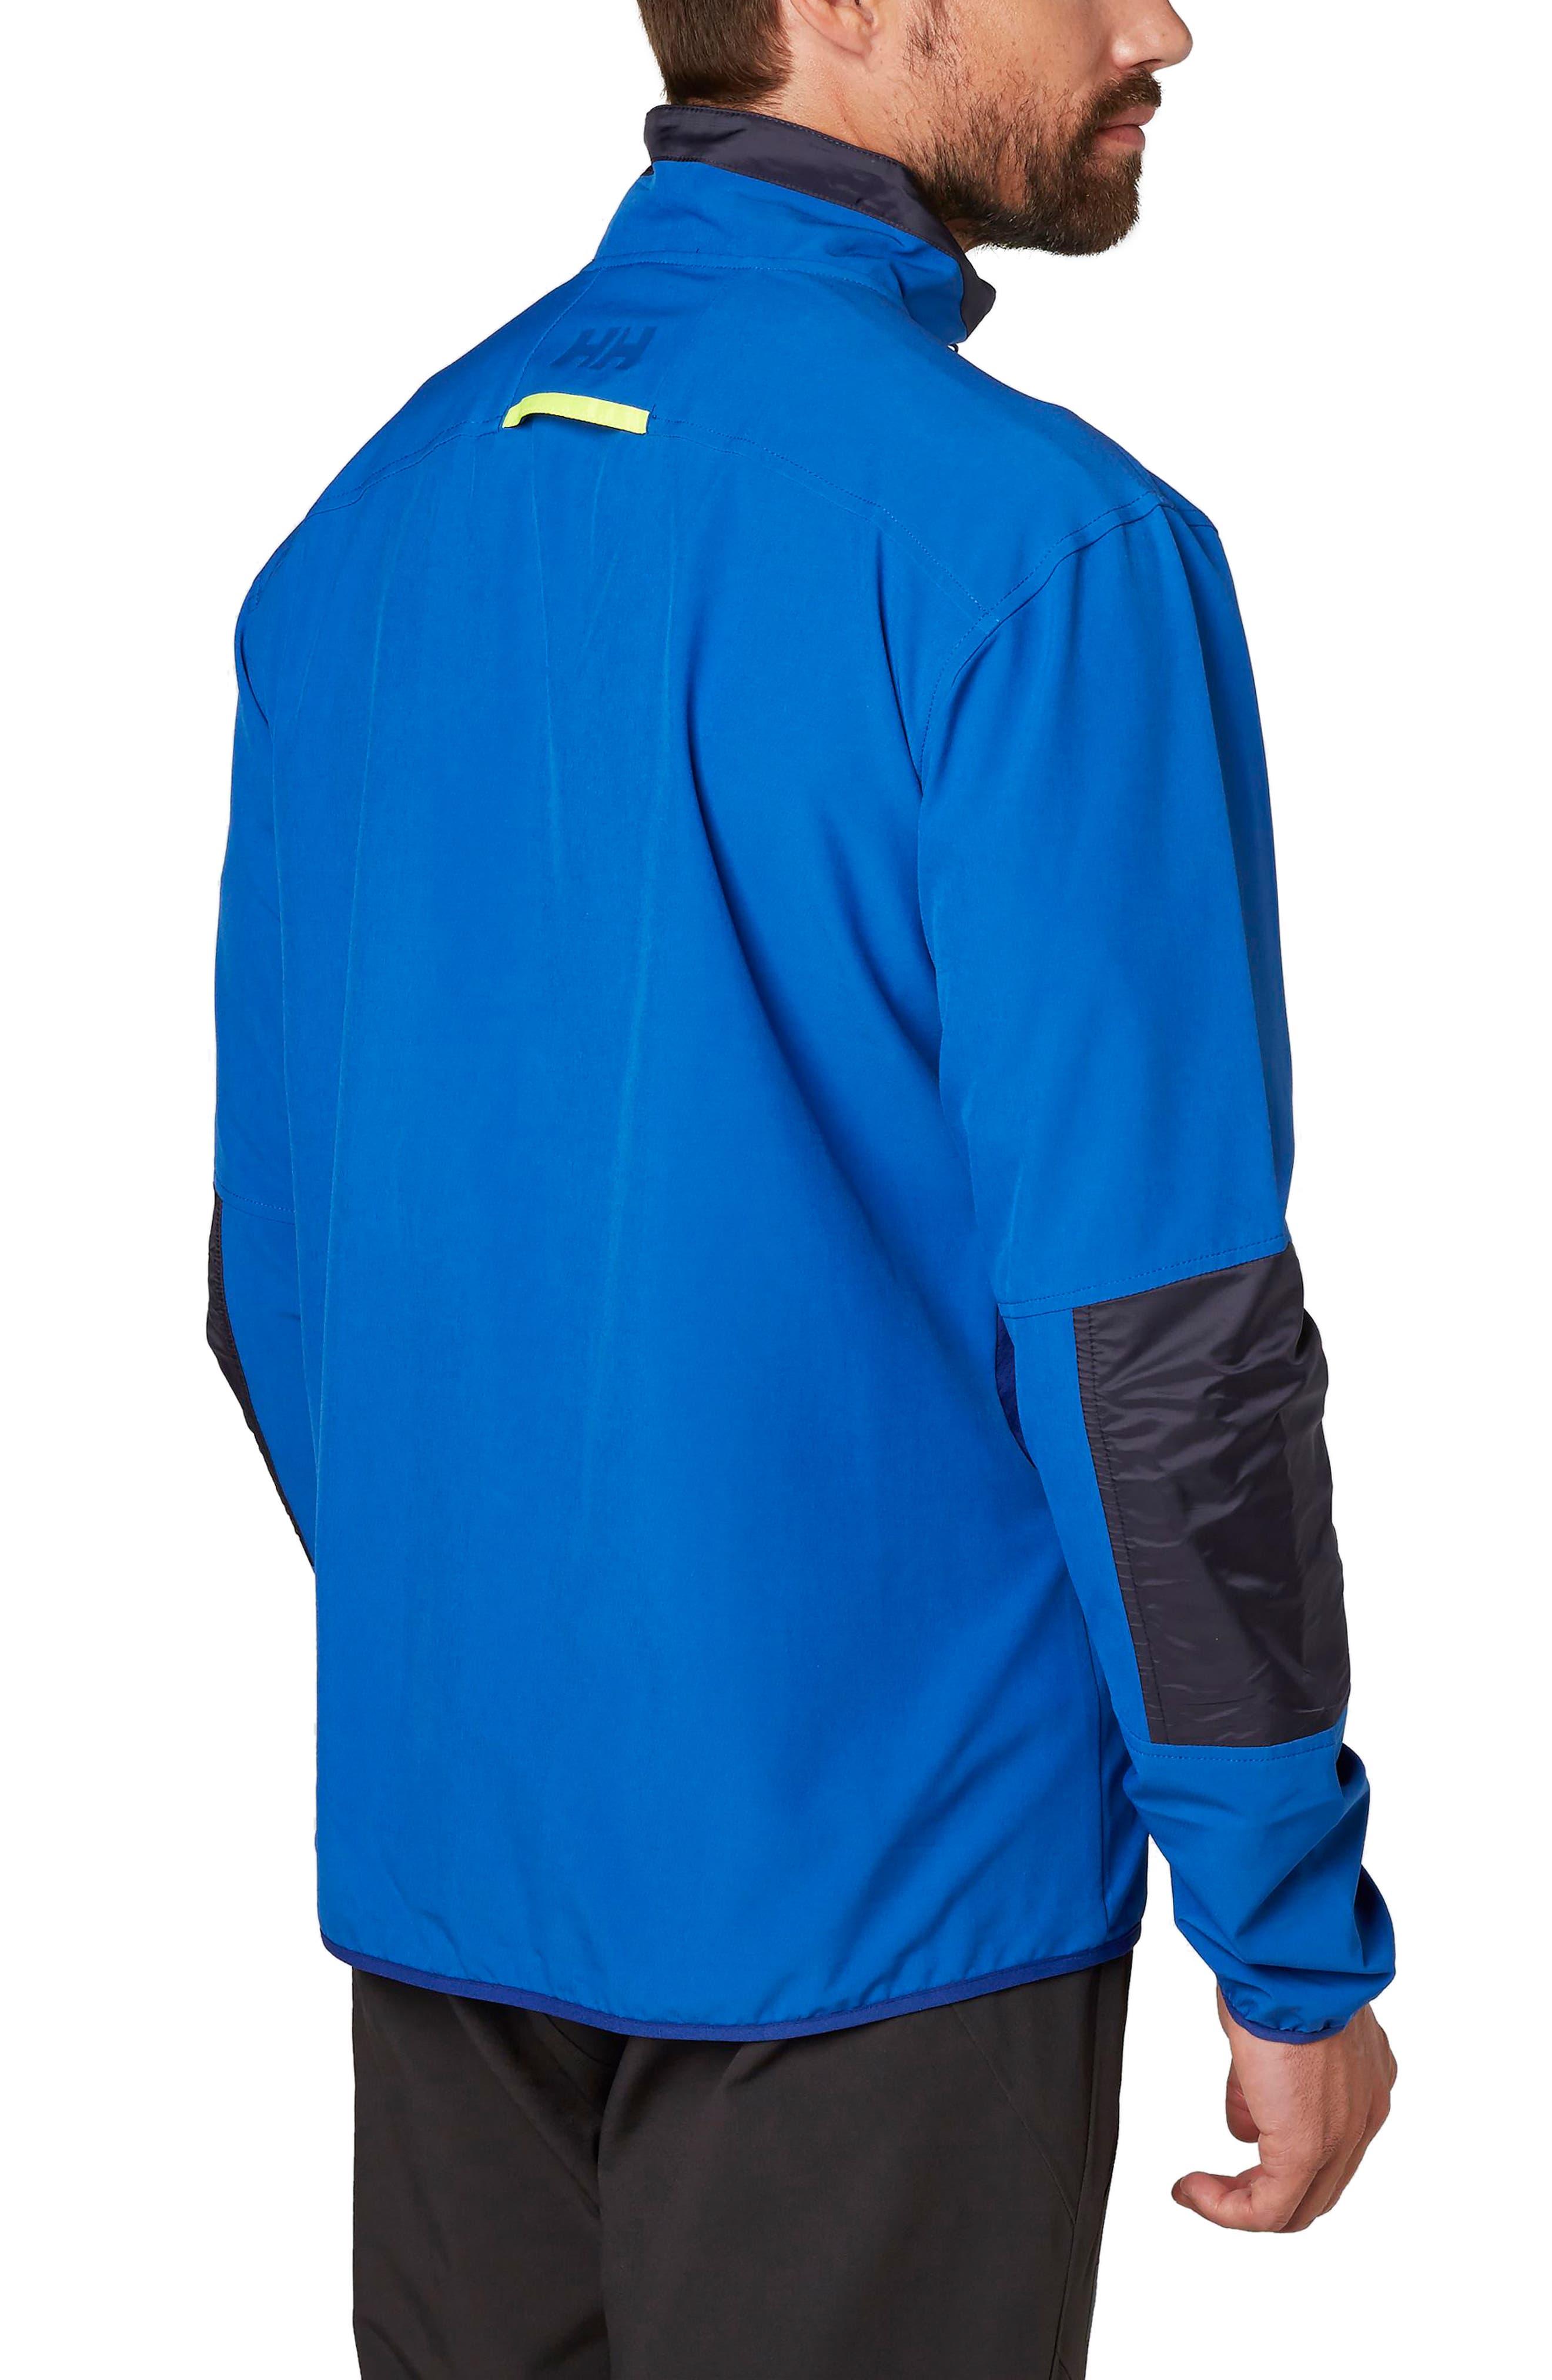 Wynn Rask Soft Shell Jacket,                             Alternate thumbnail 2, color,                             Olympian Blue